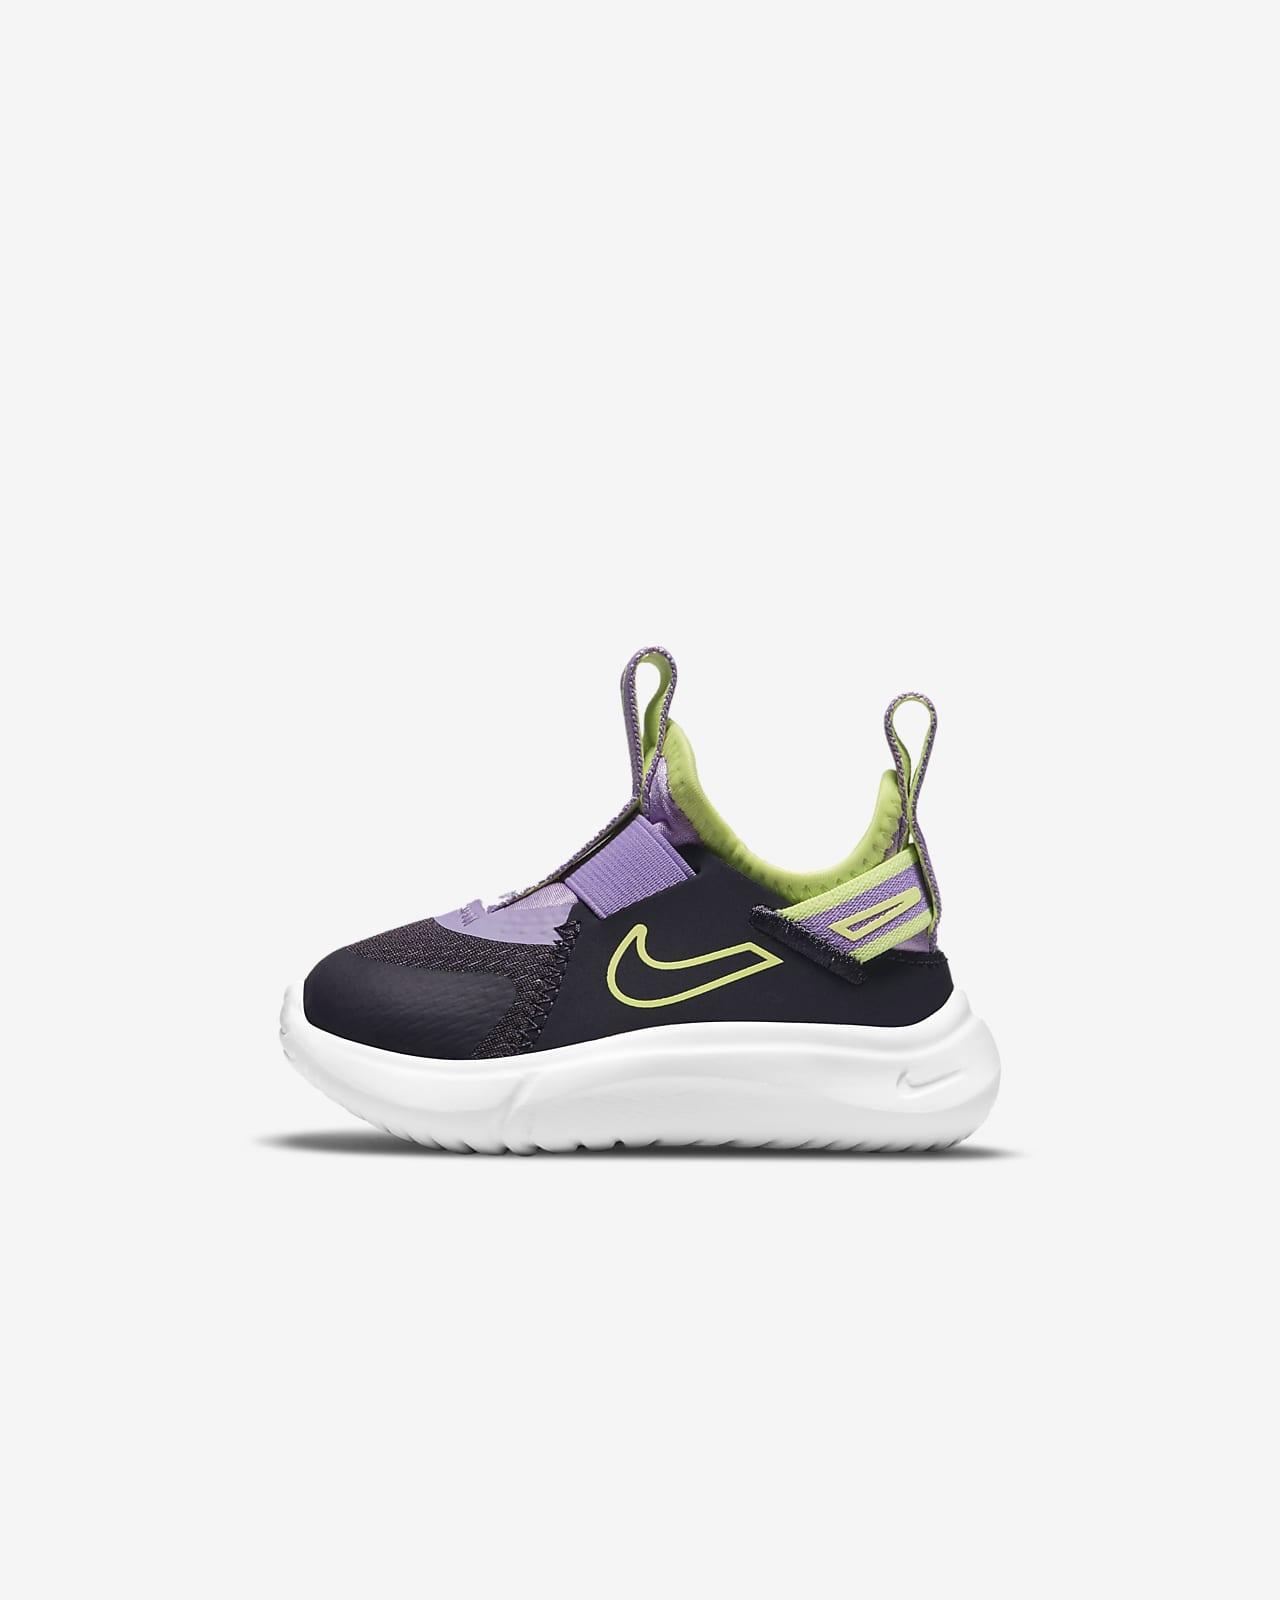 Nike Flex Plus Baby/Toddler Shoes